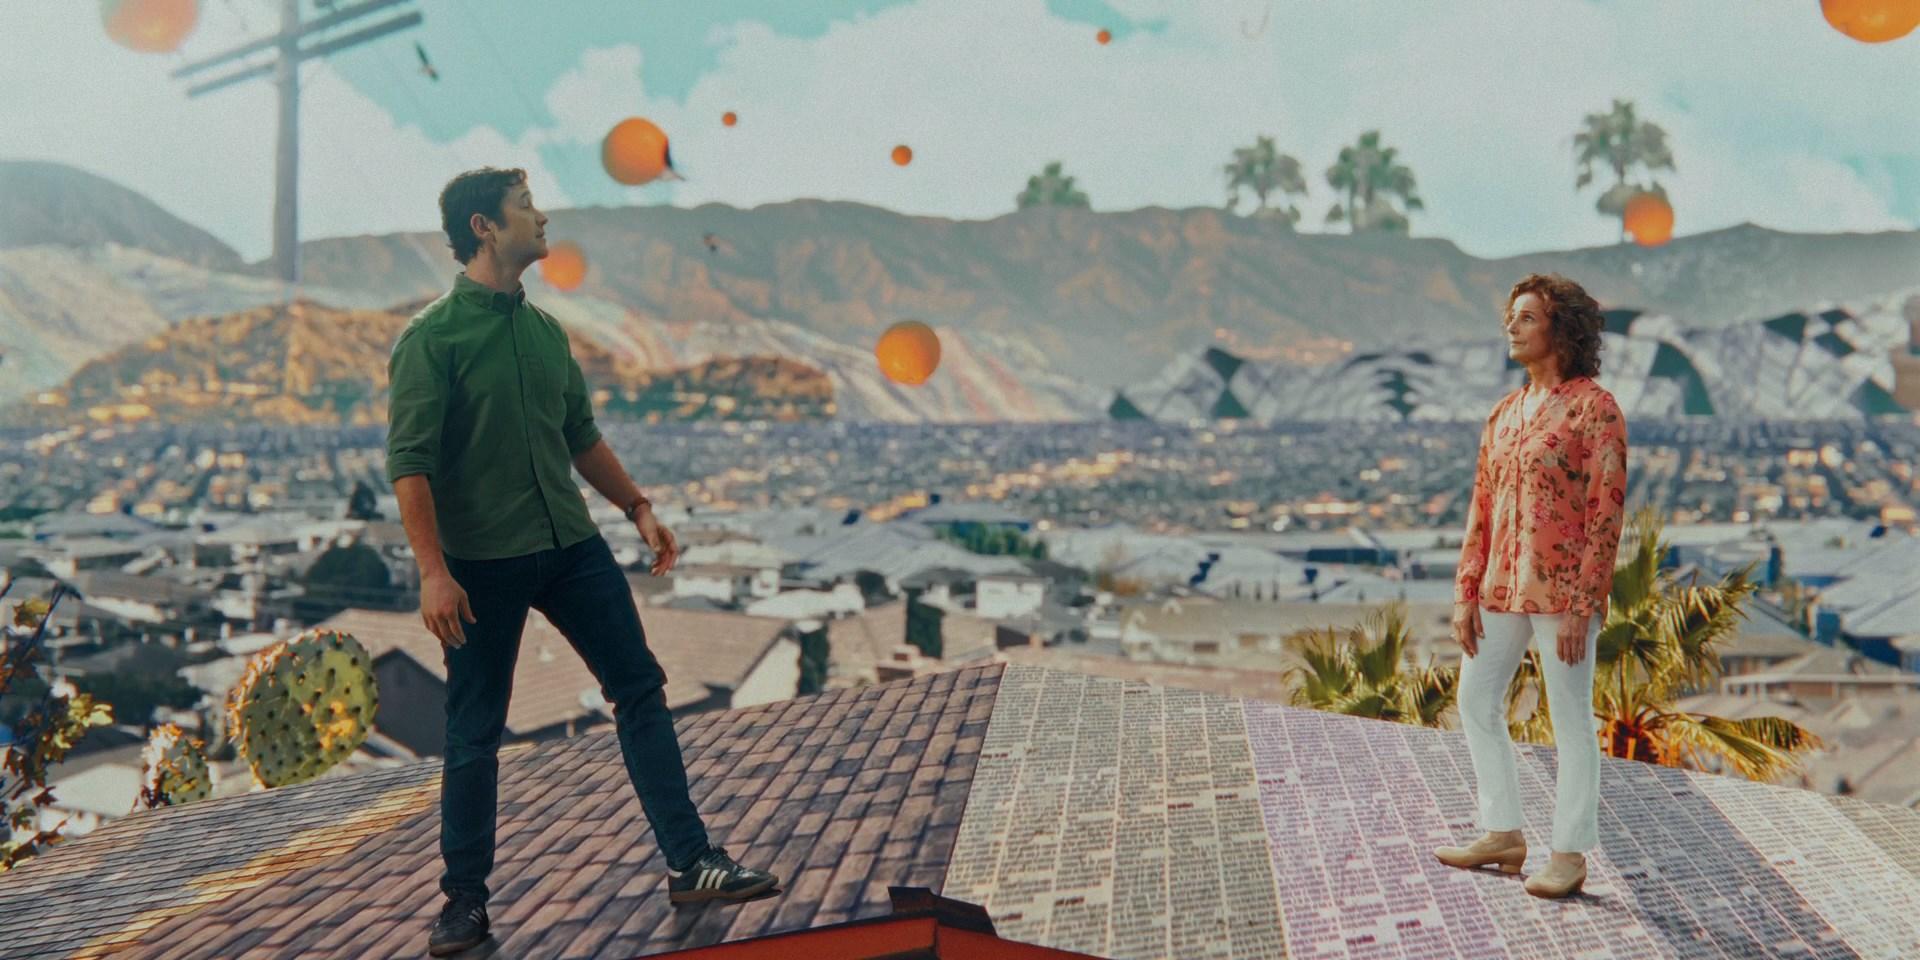 Mr. Corman Temporada 1 (2021) 1080p WEB-DL Latino